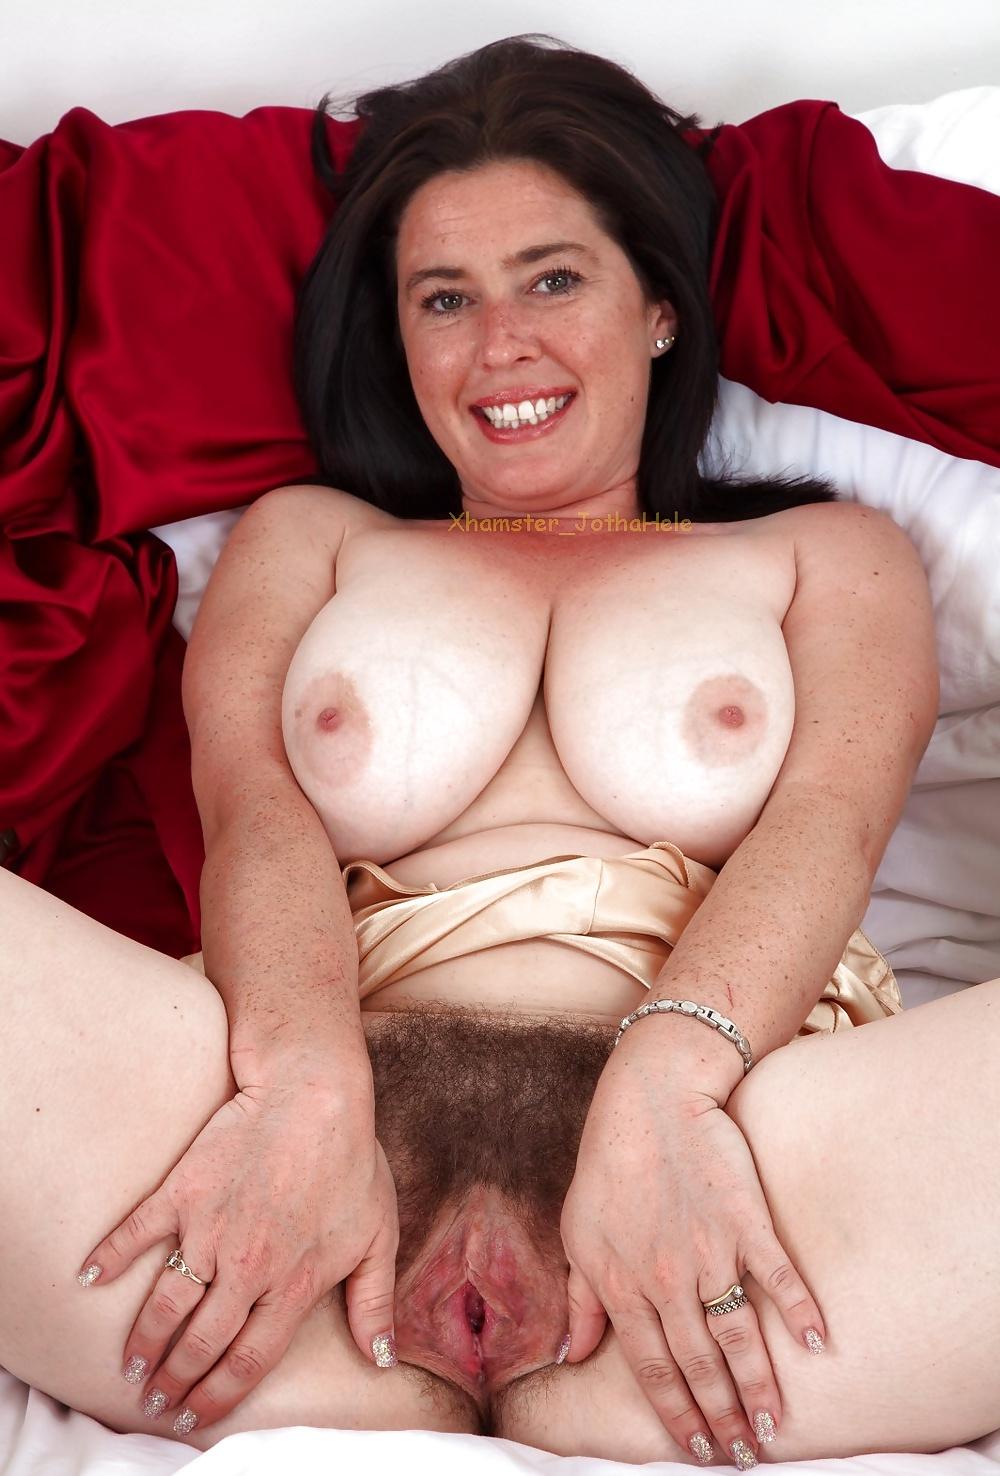 Hairy momma's